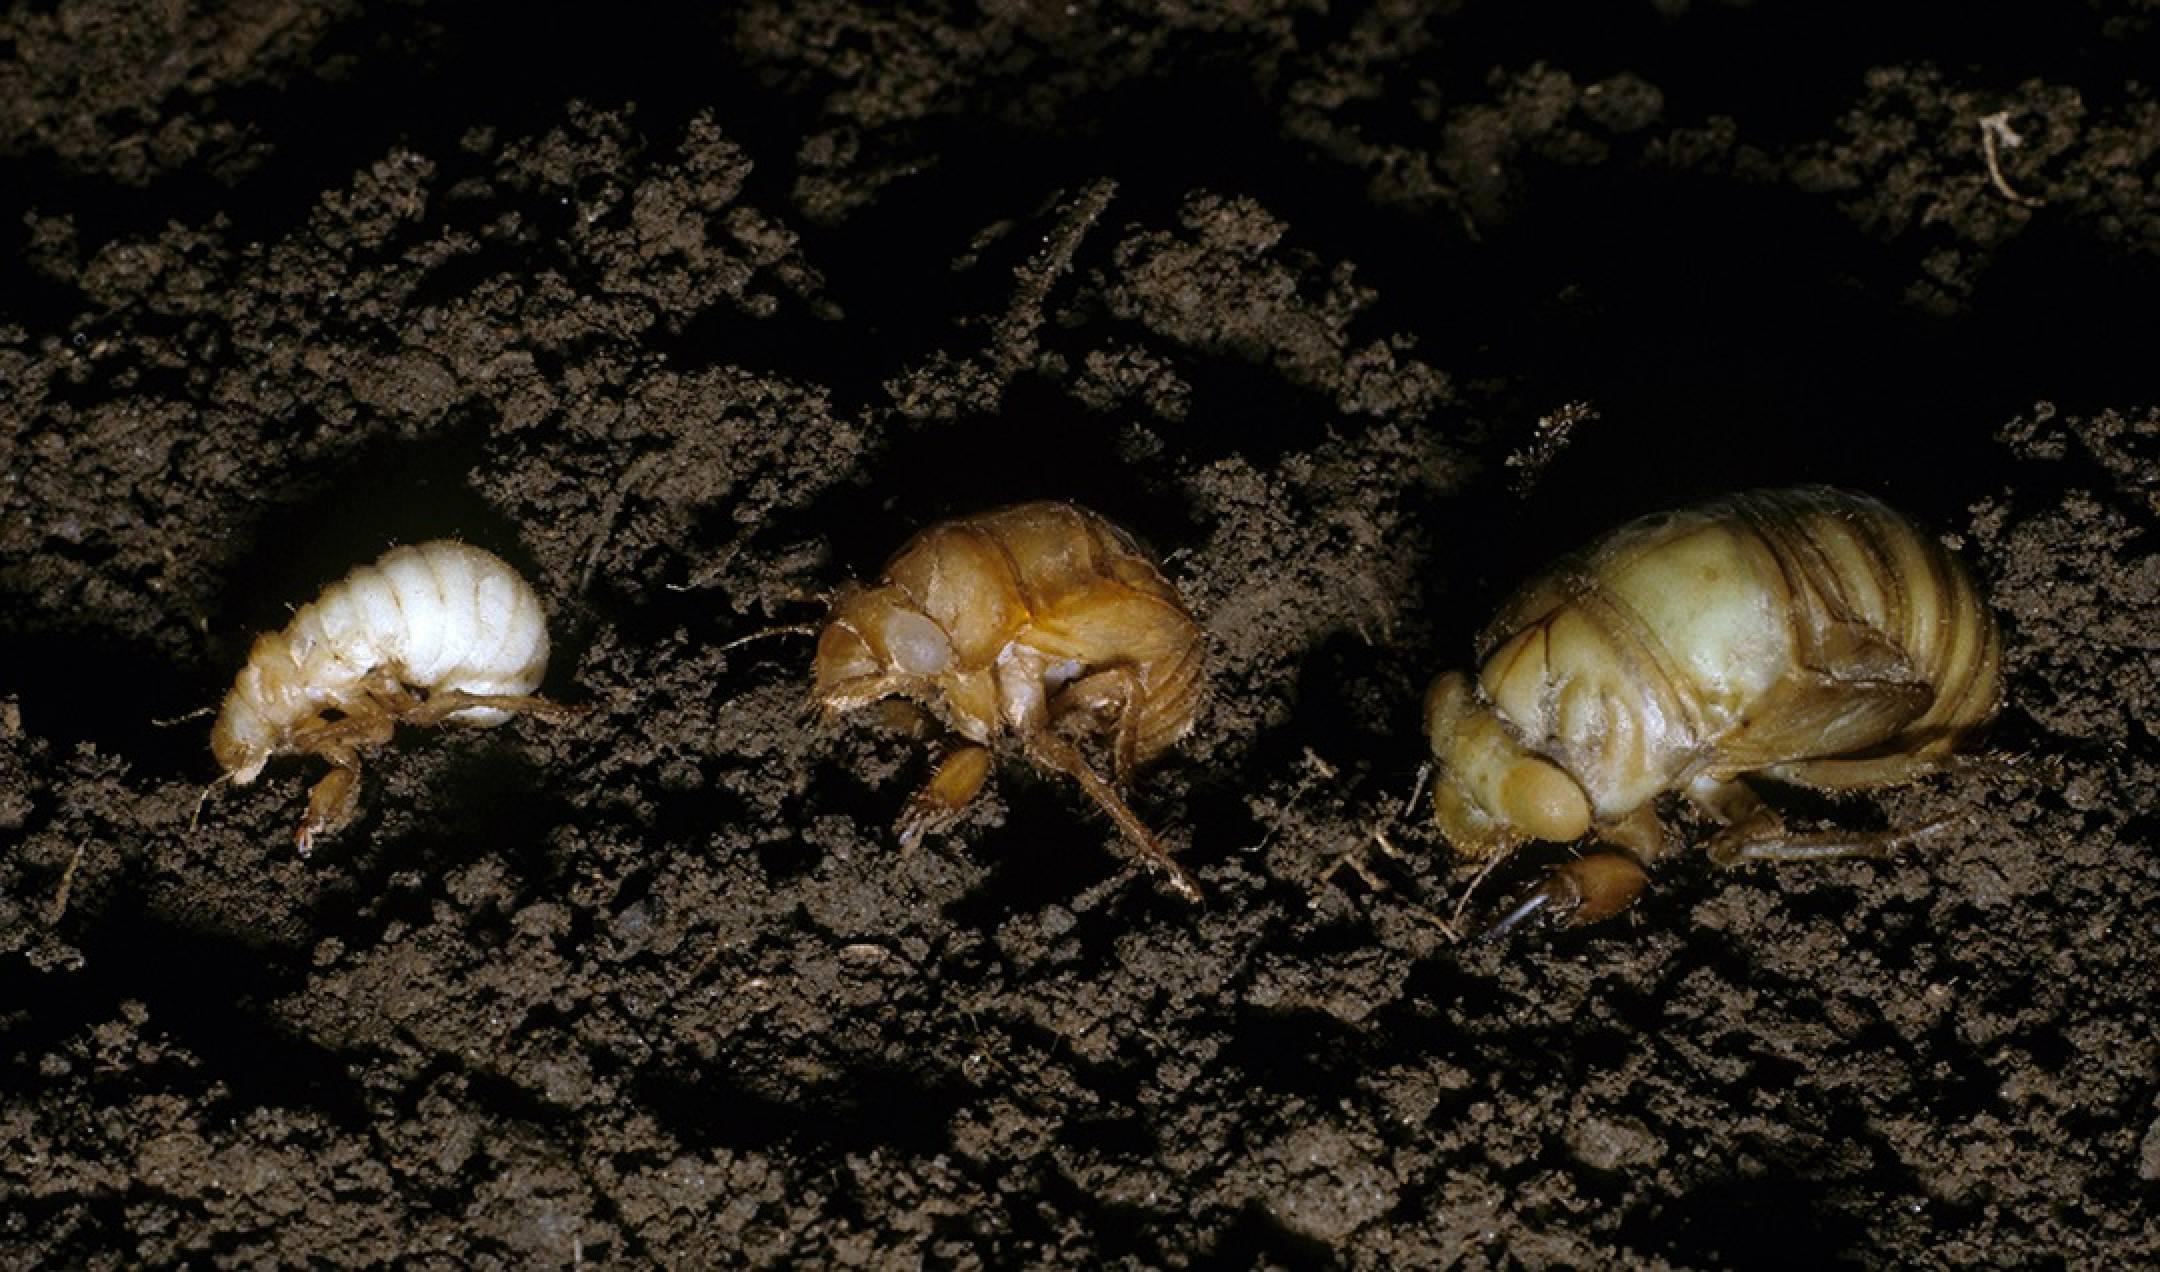 17 Year Cicada Bugs